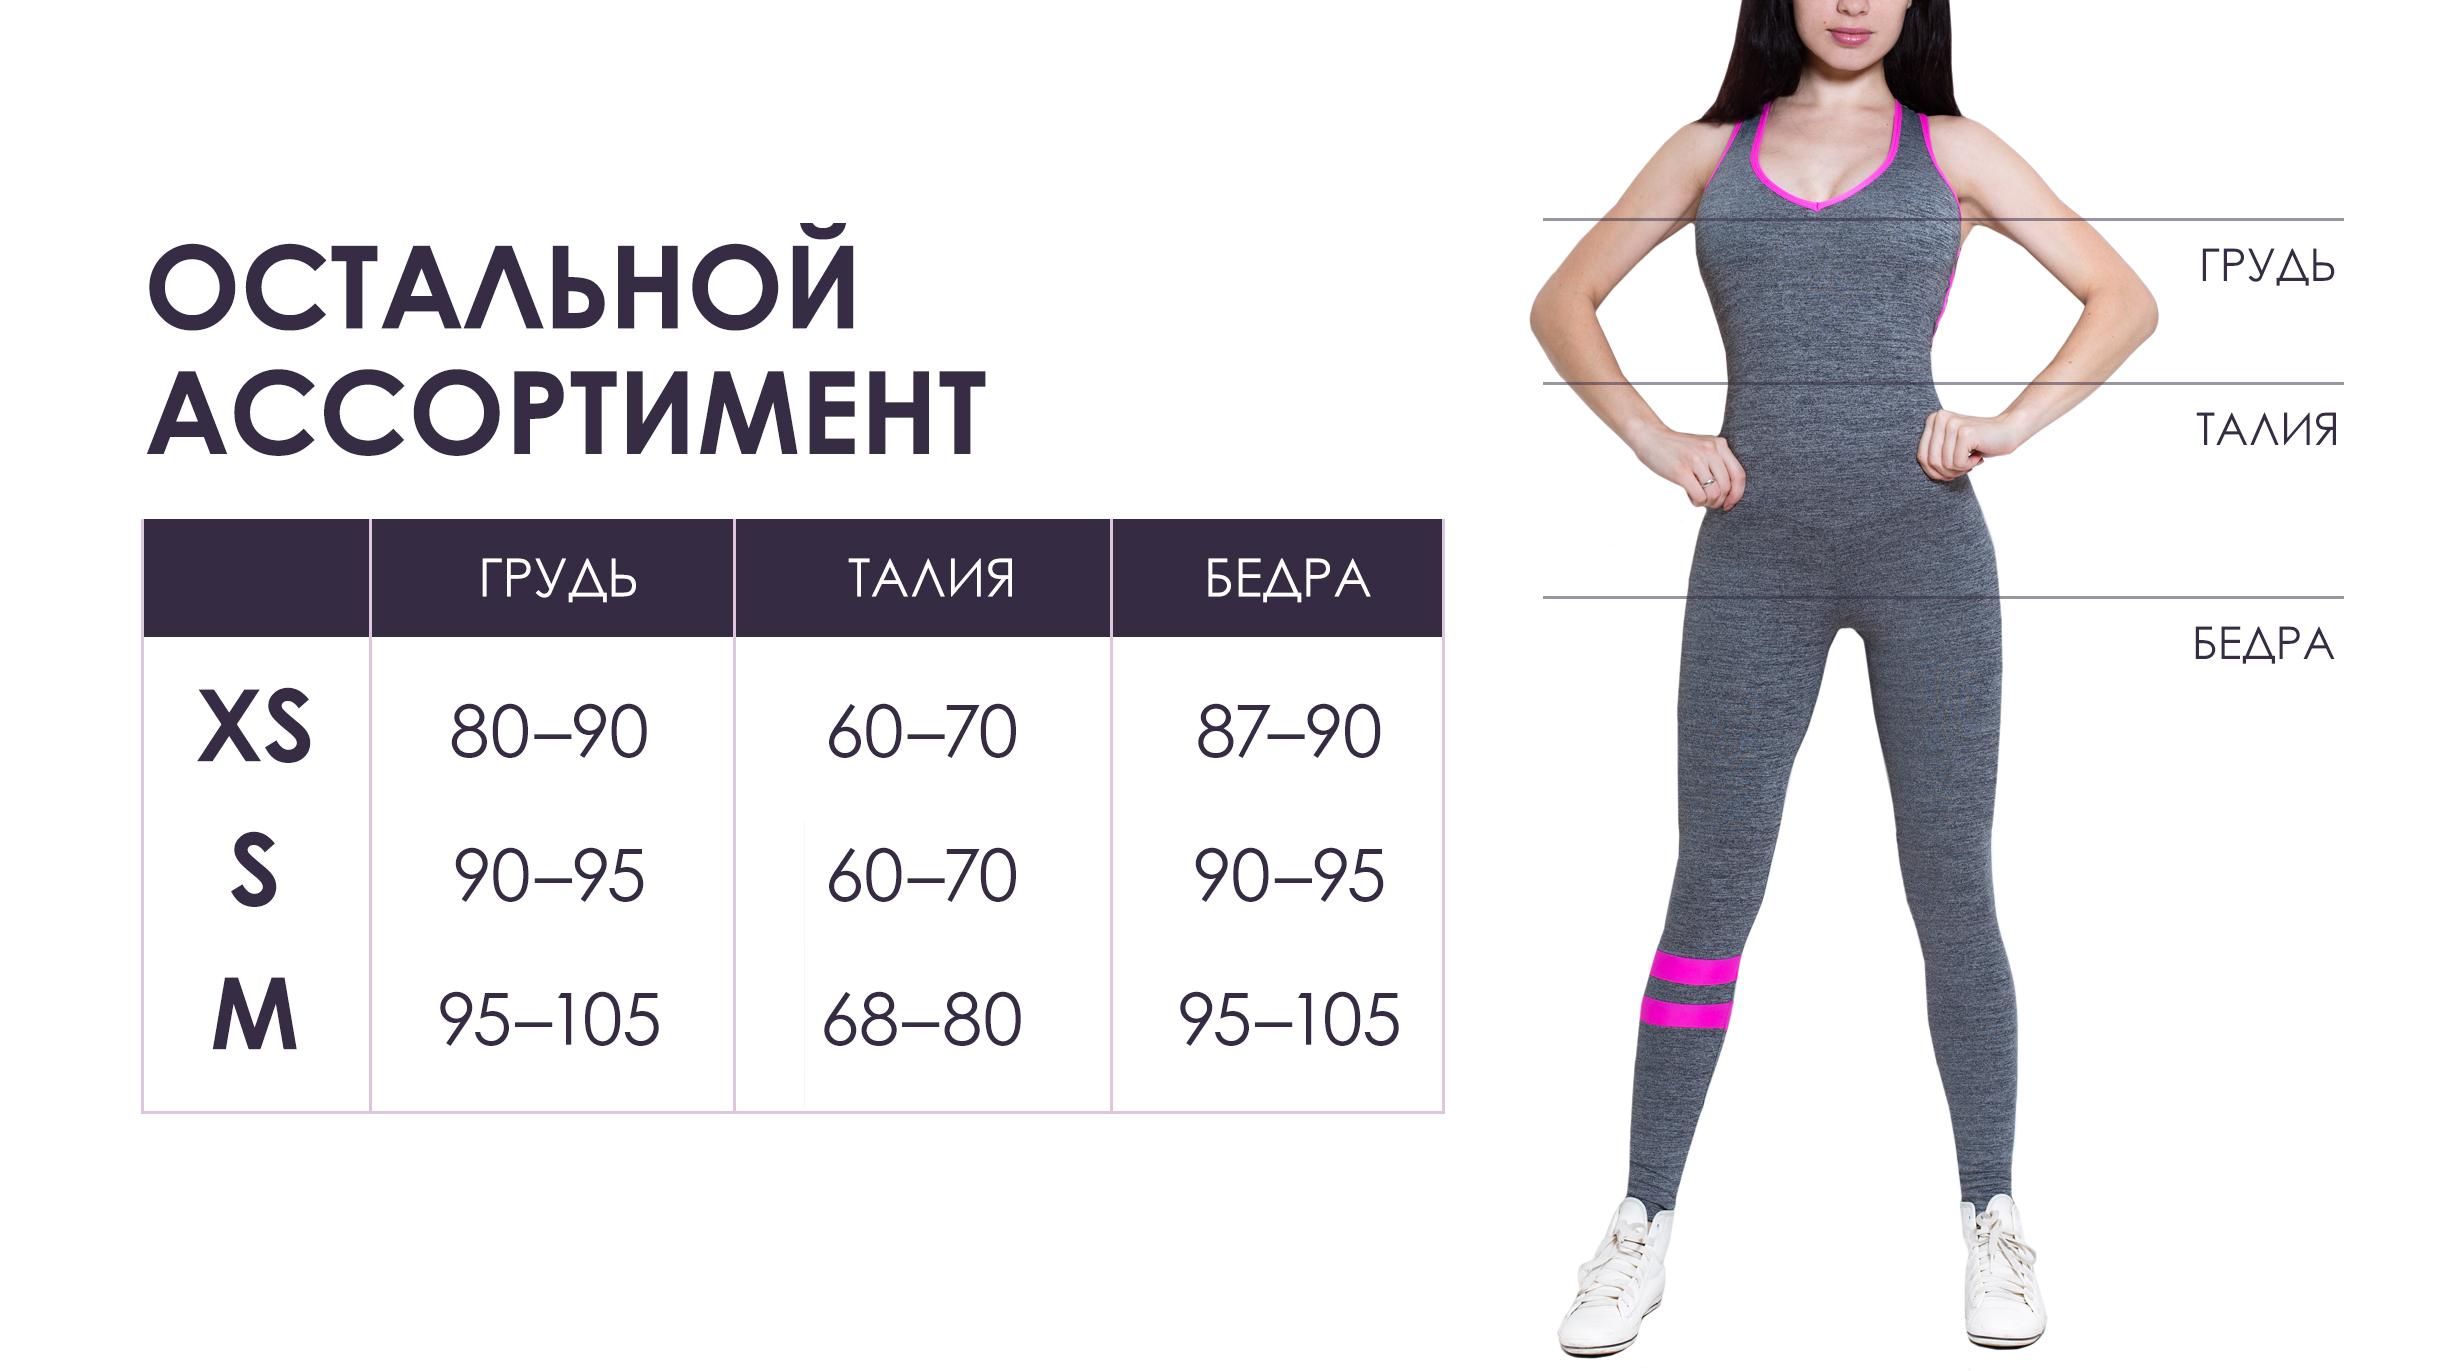 fs-size.jpg